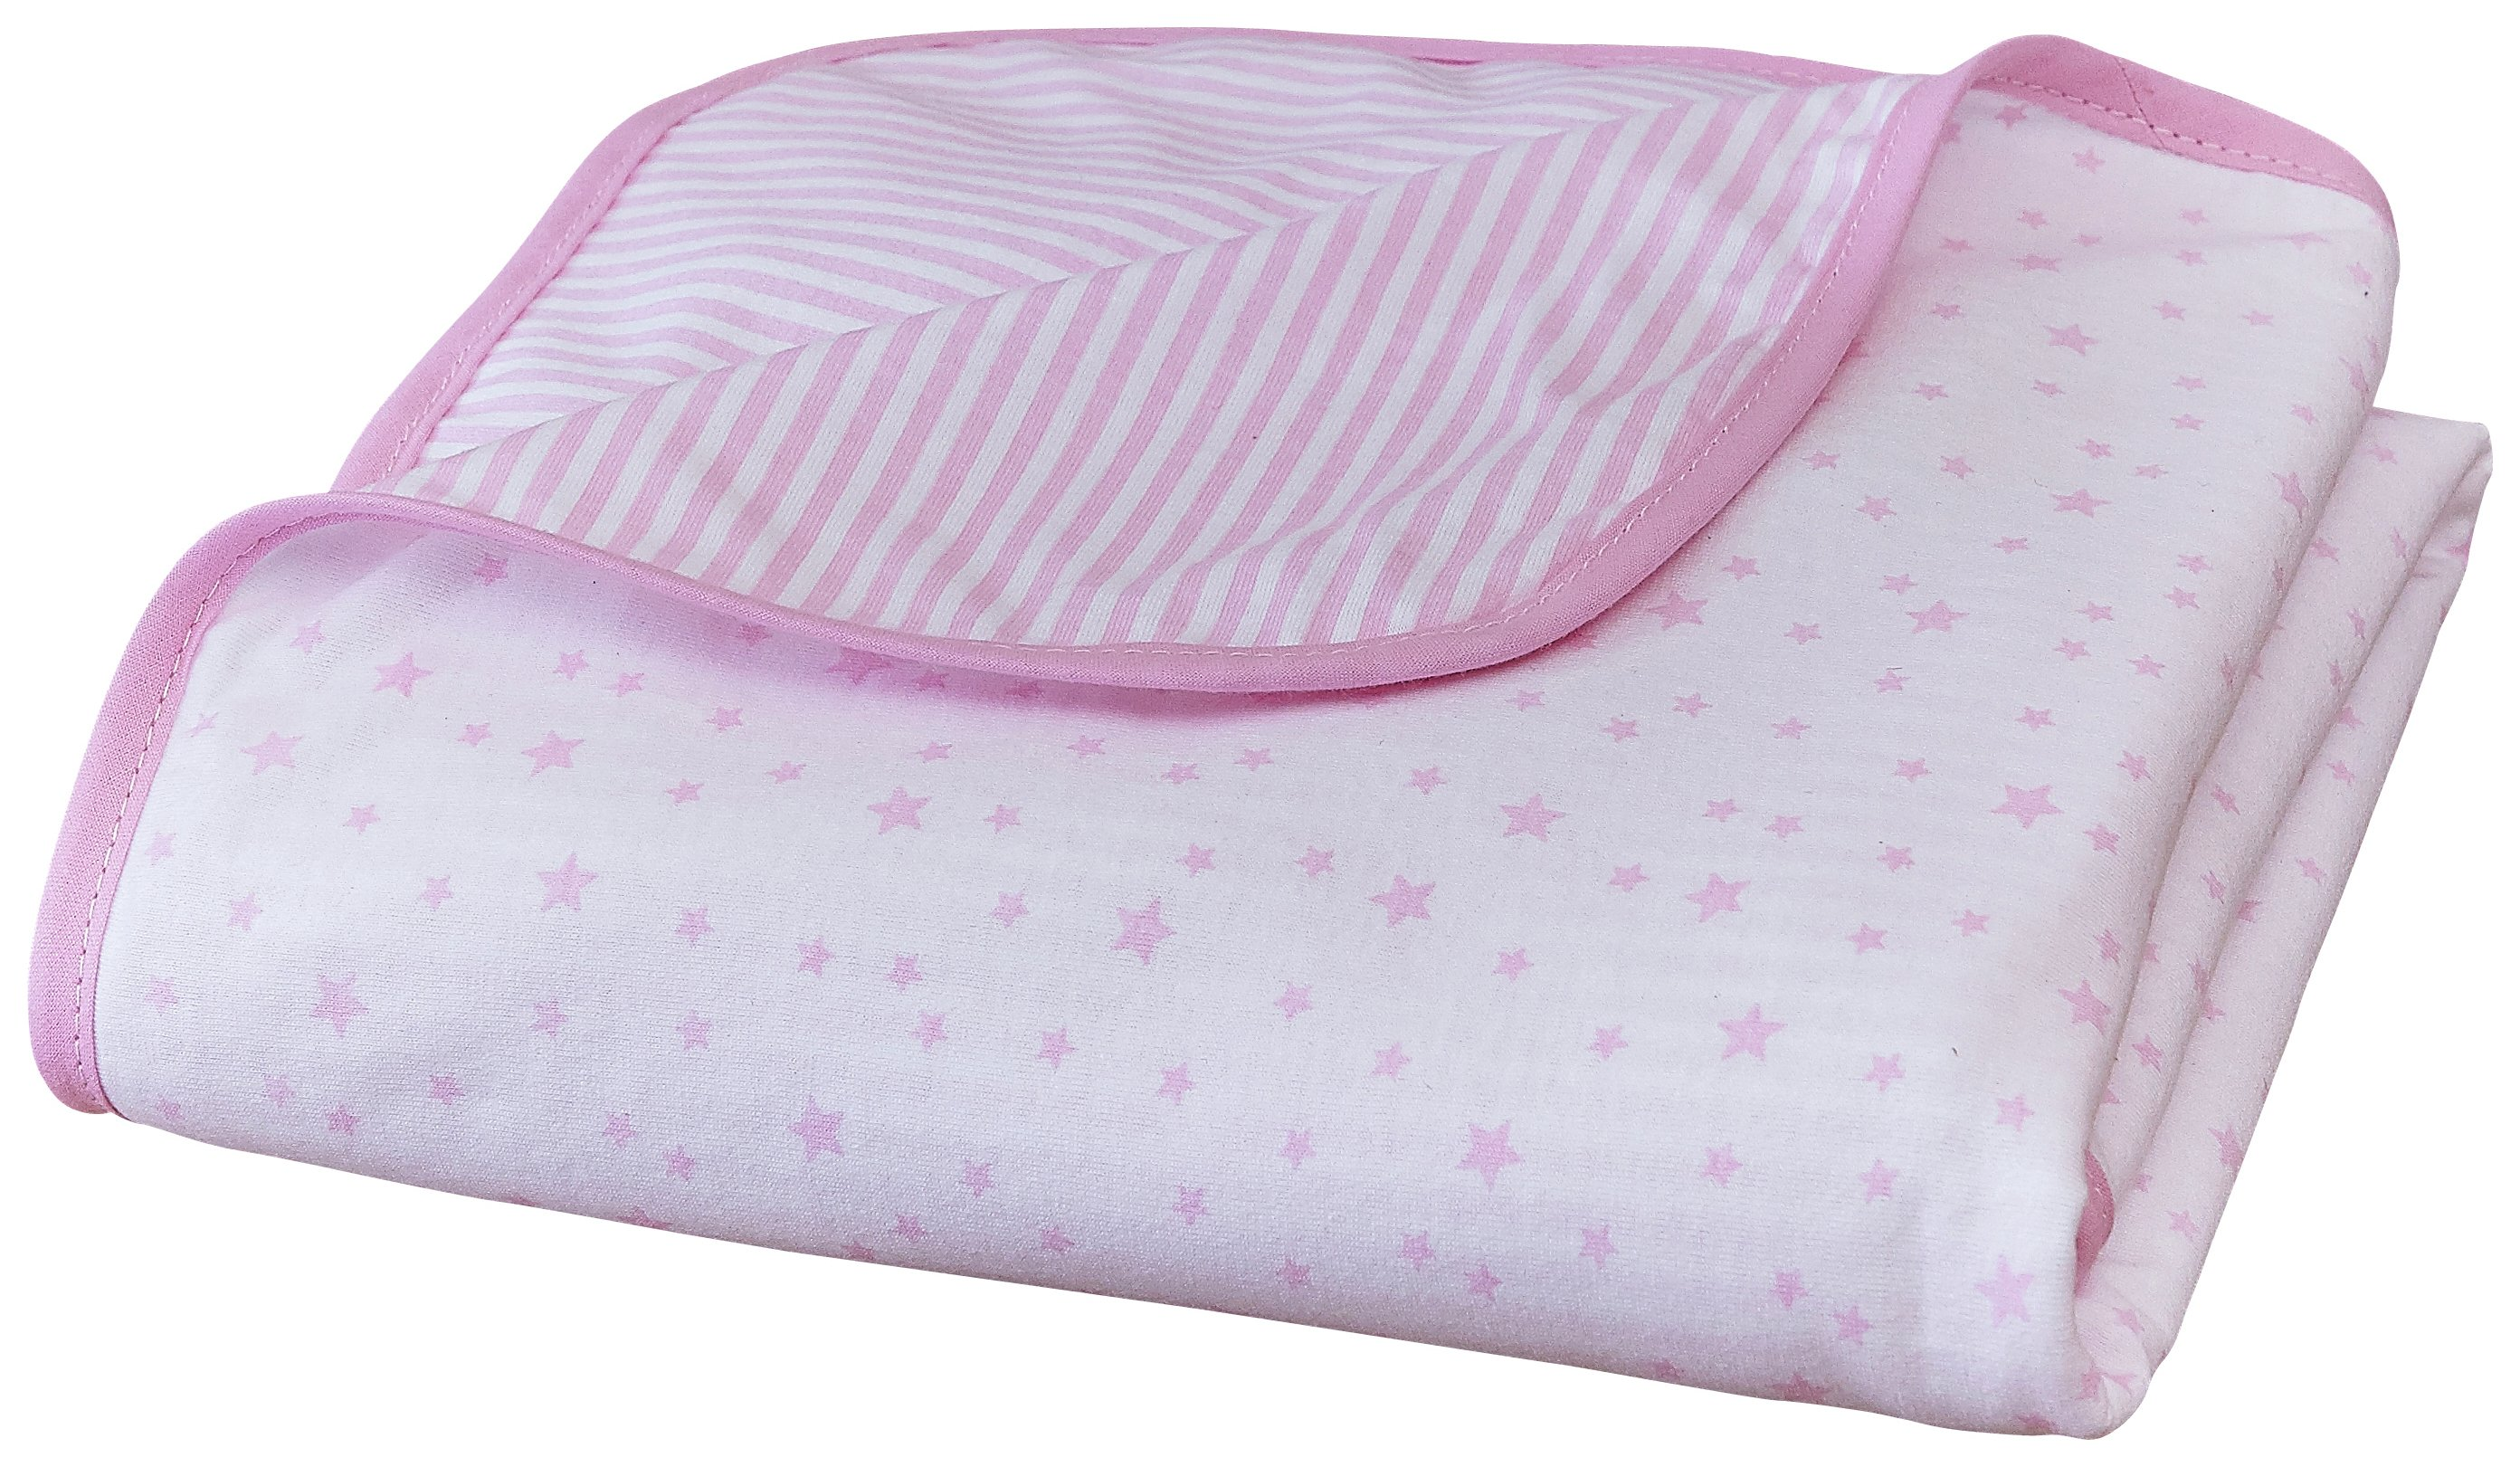 Clair De Lune Stars & Stripes Cot Blanket -  Pink